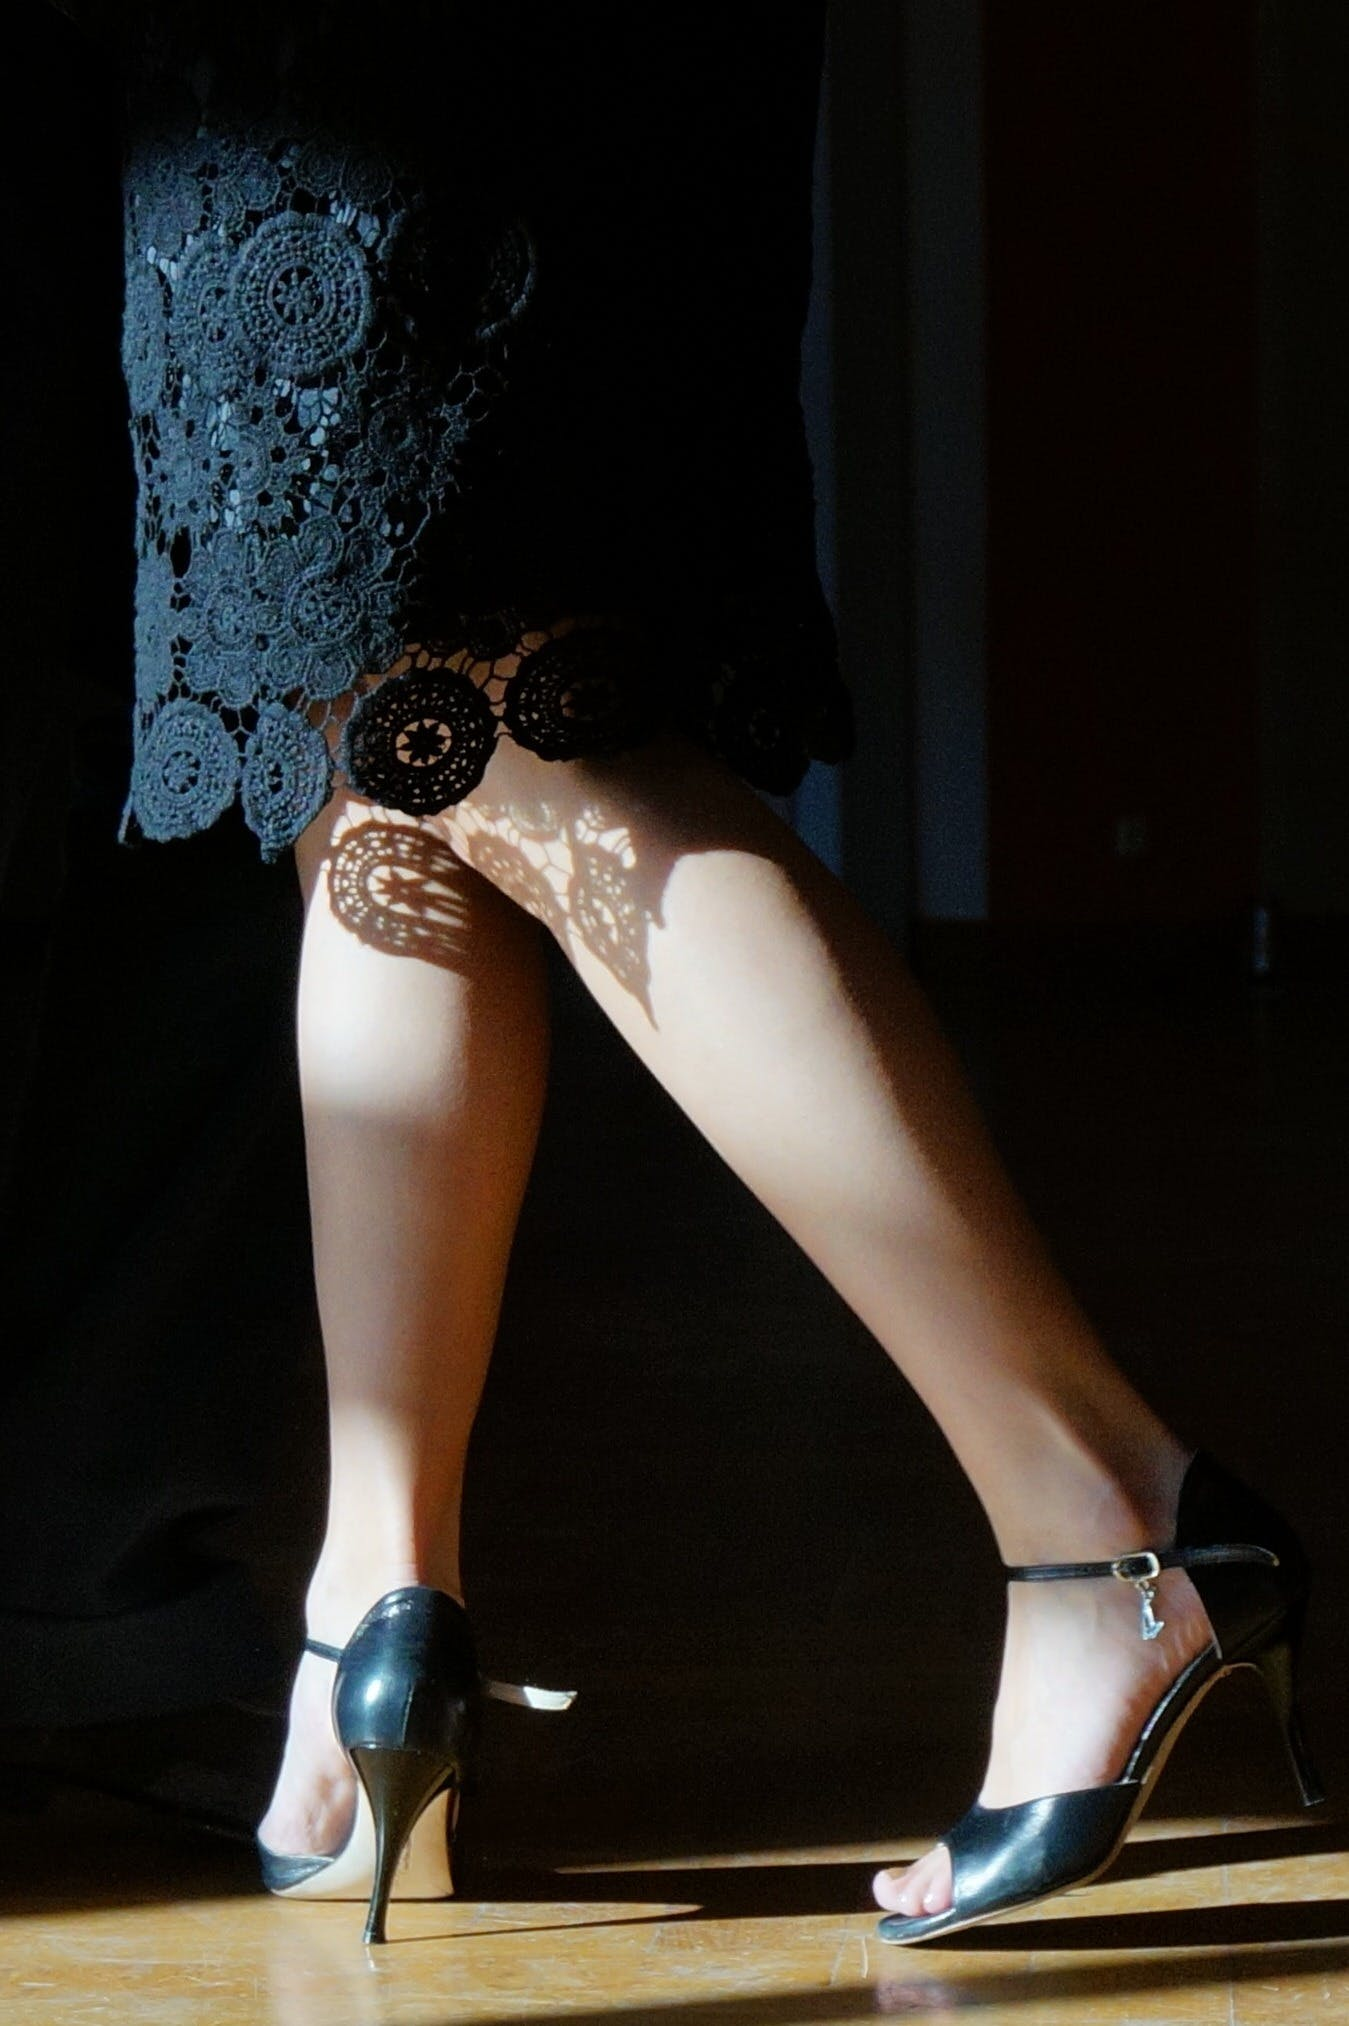 Pair of Women's Black Stilettos